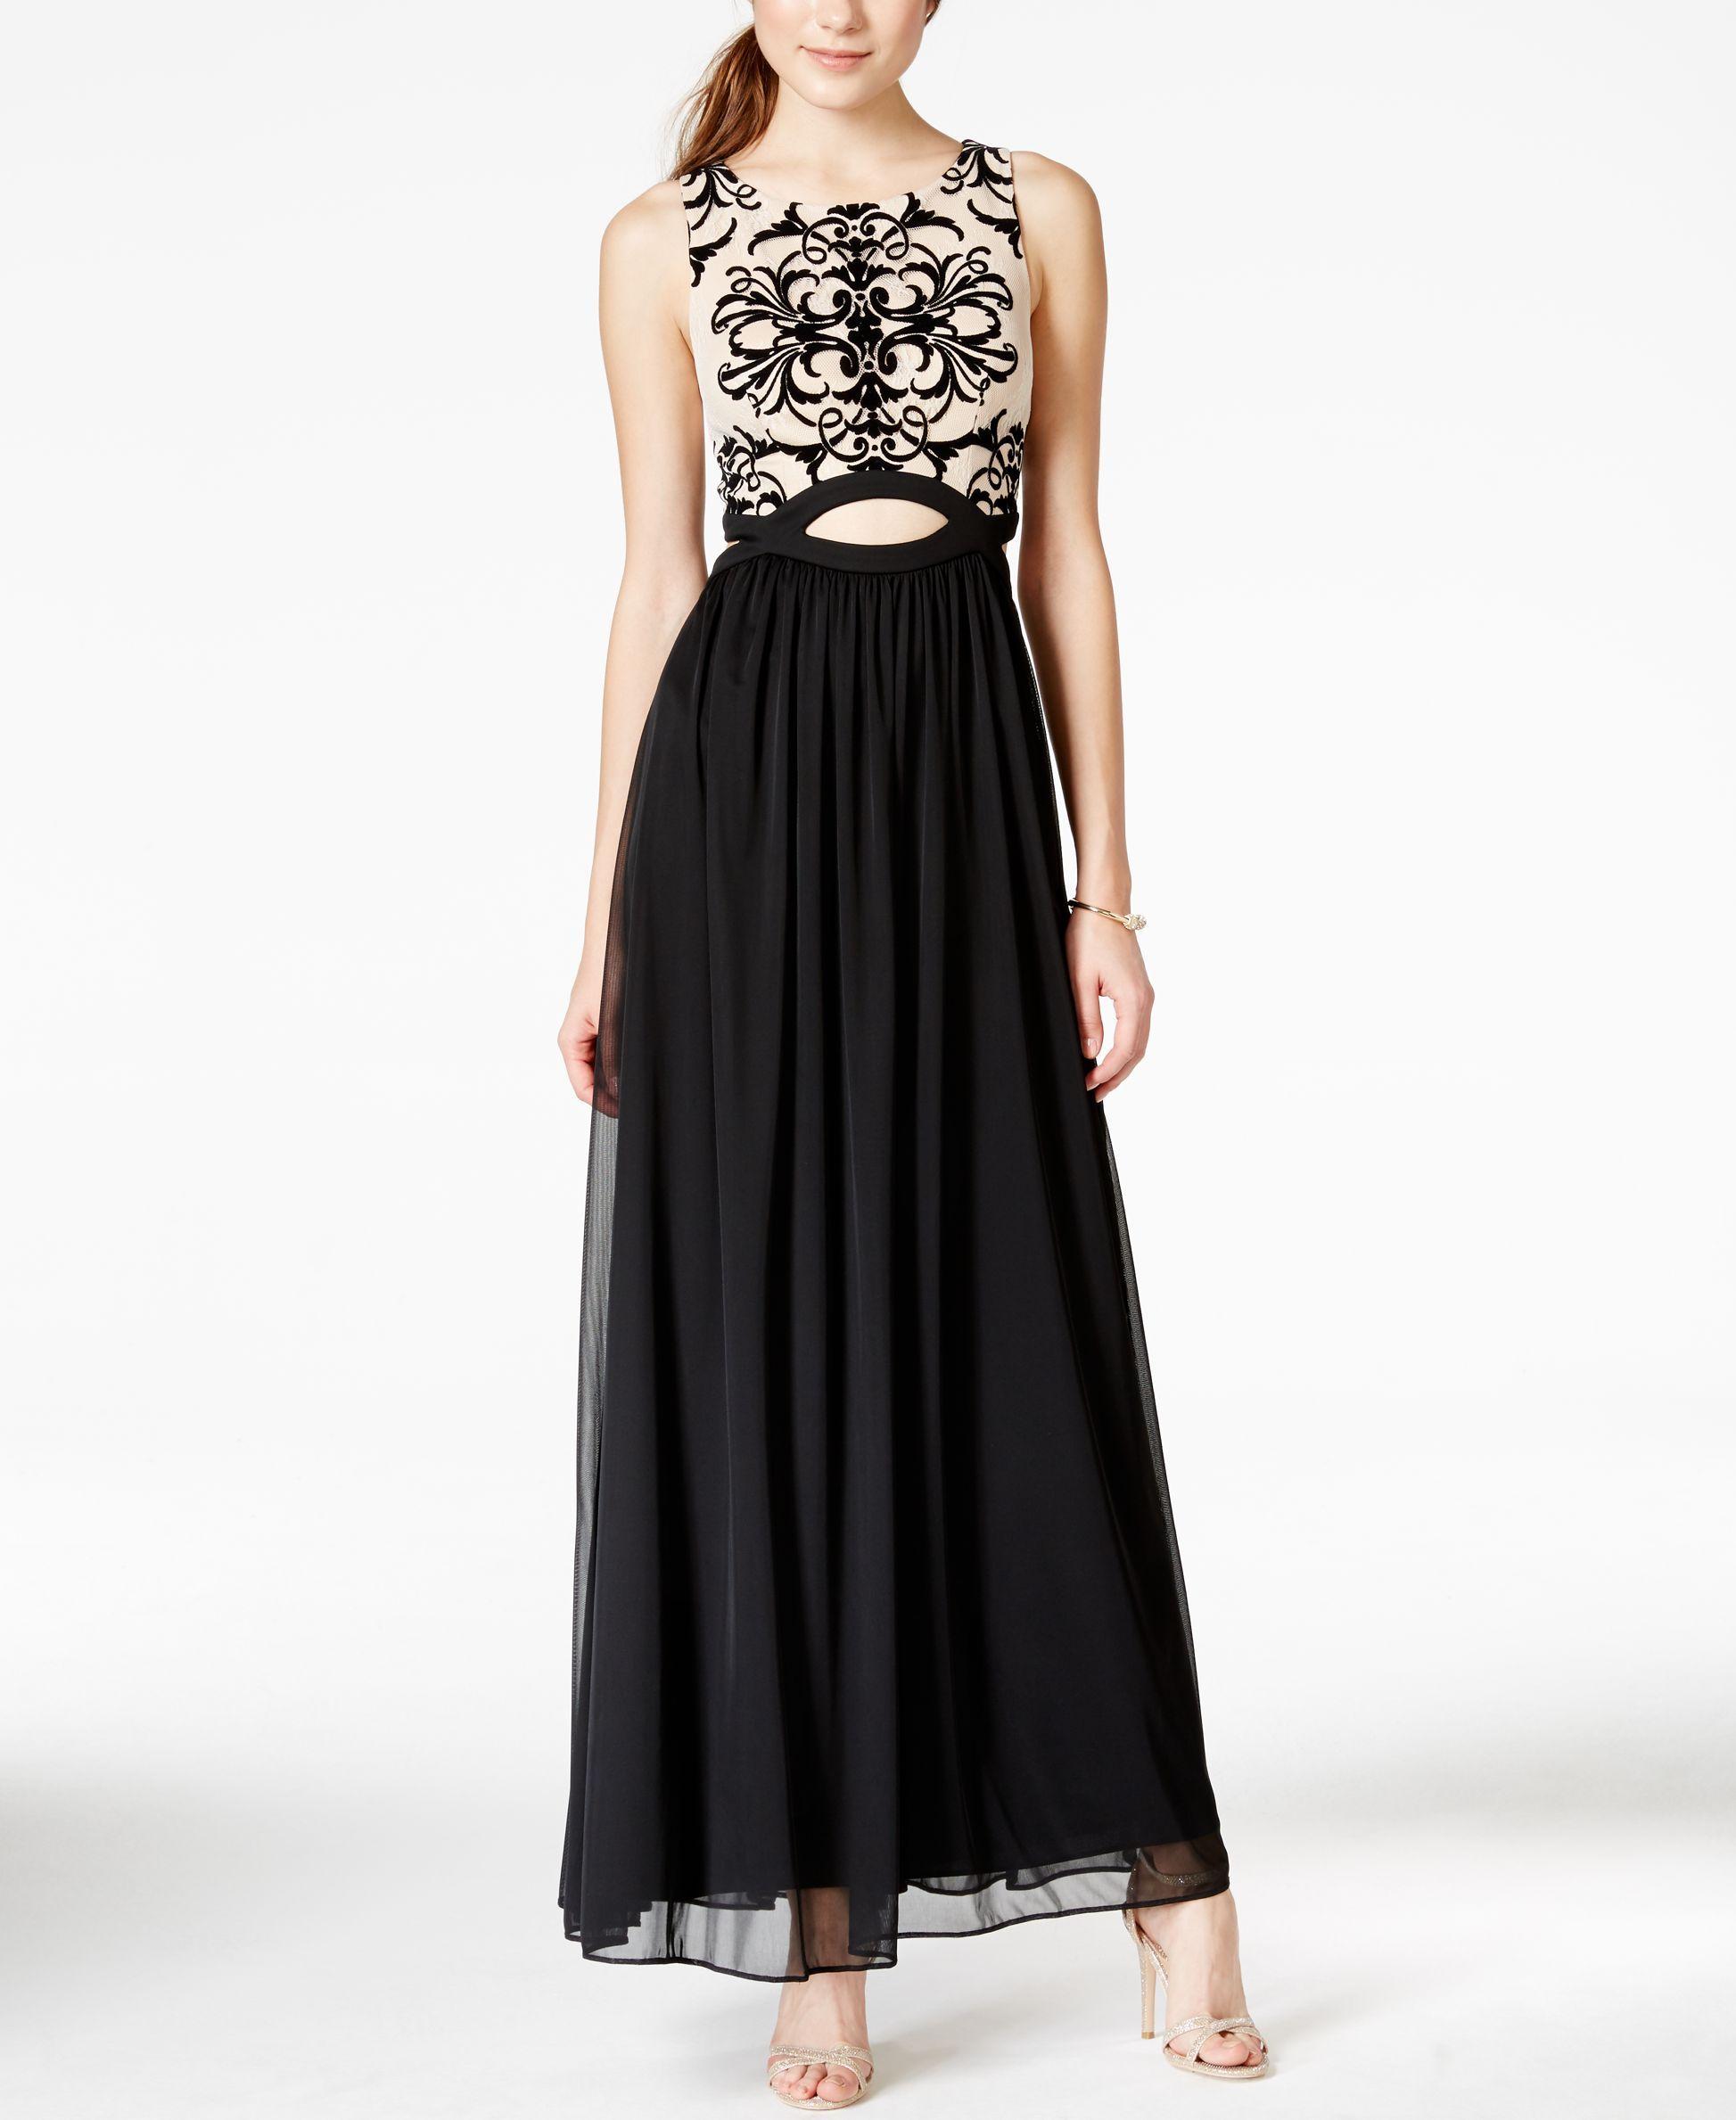 Blondie nites juniorsu flocked lace cutout gown products